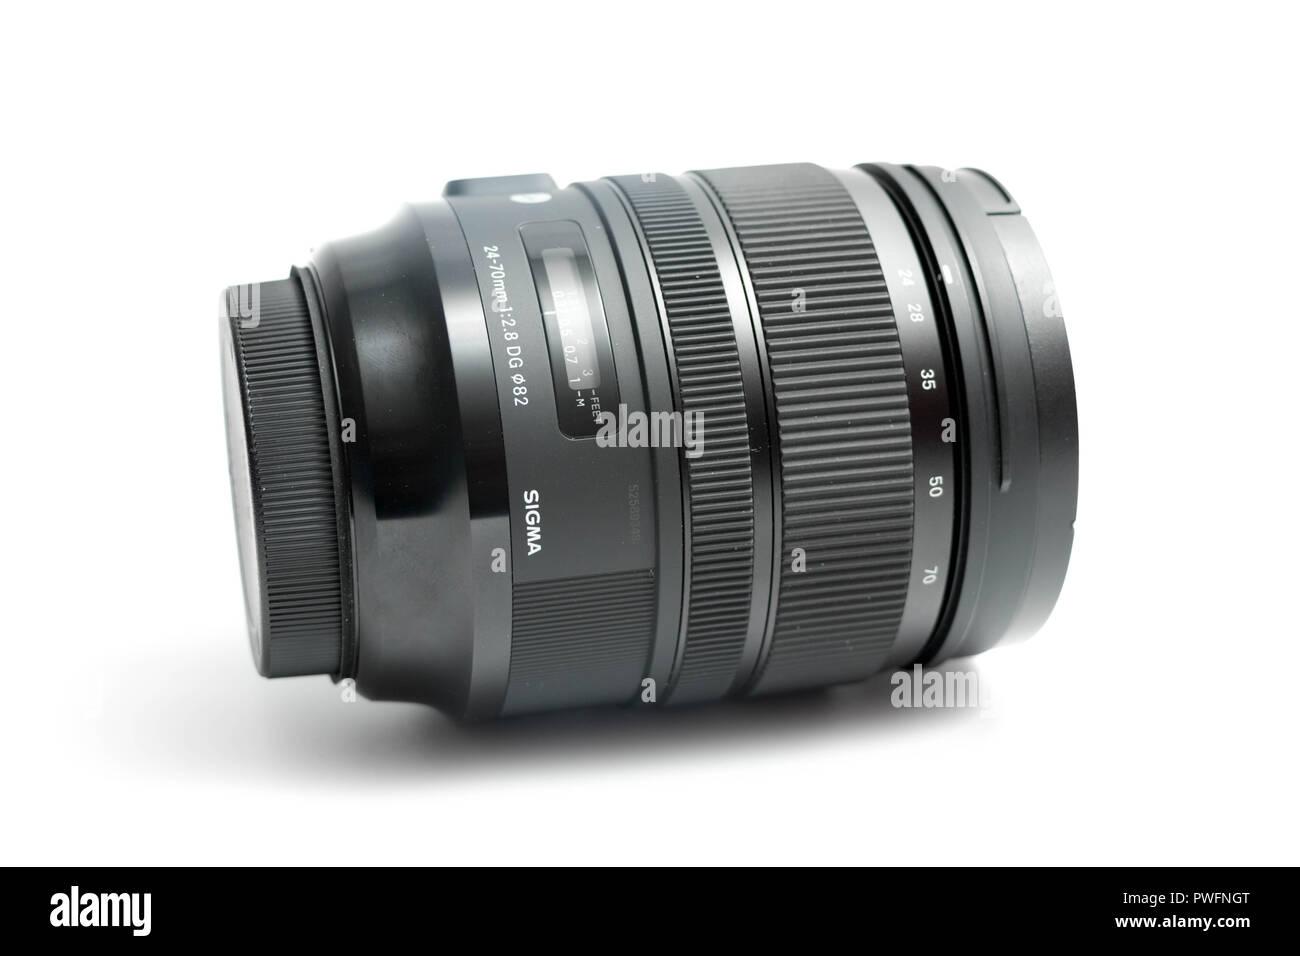 78fd5a3f52 Cerrar hasta el Sigma 24-70mm Lente 2.8 Cámara de apertura Imagen De Stock